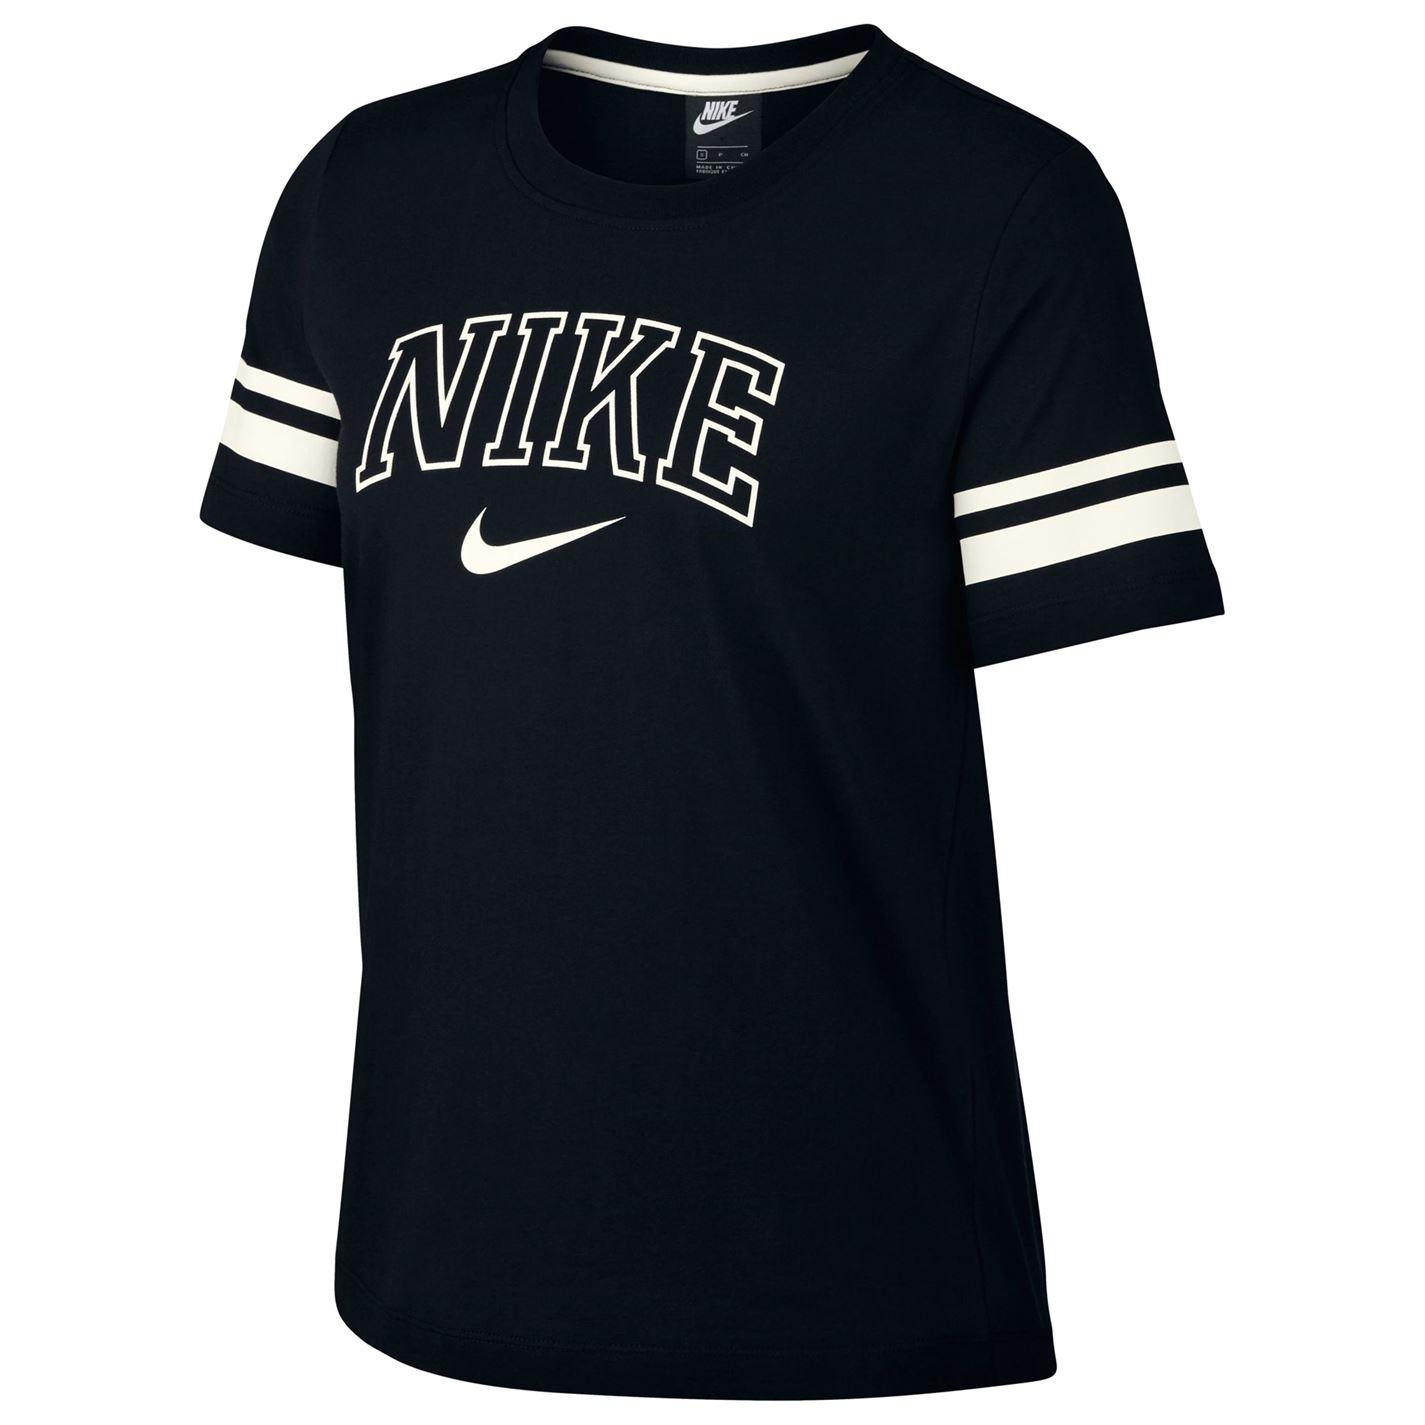 Nike Varsity dámske tričko